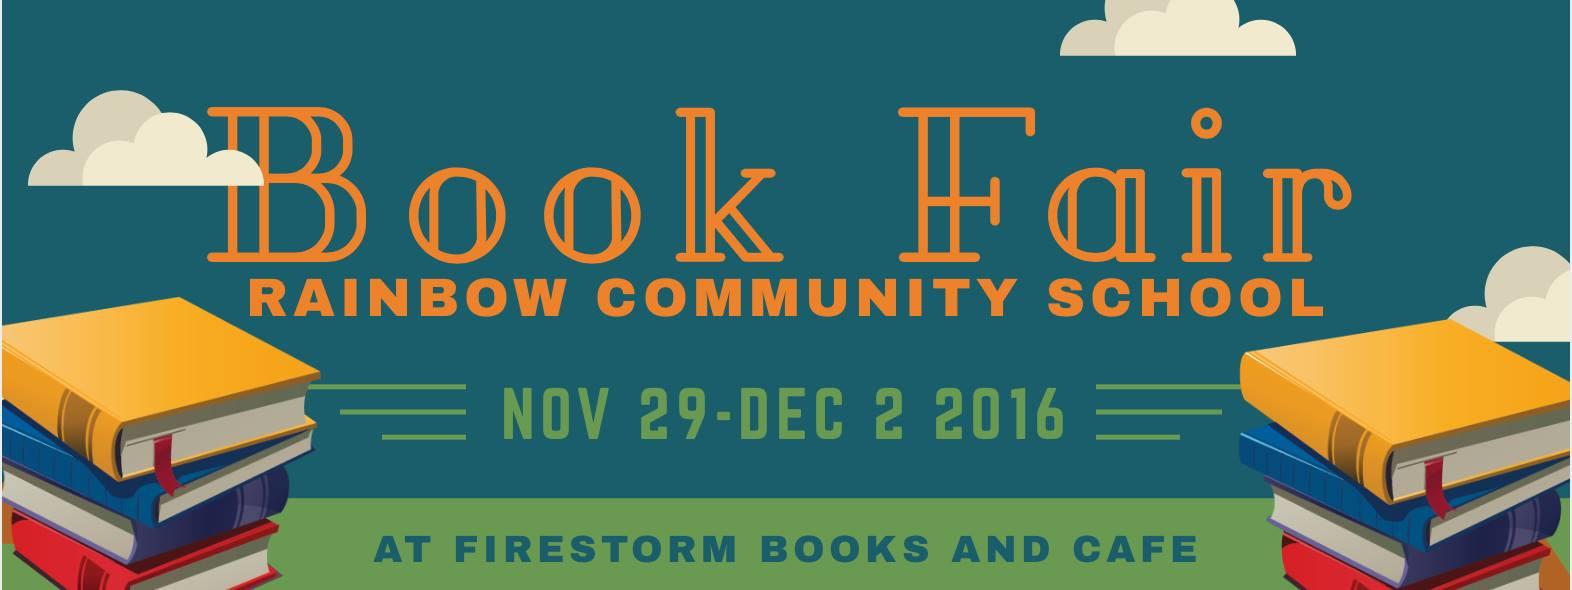 Rainbow Community School Book Fair at Firestorm